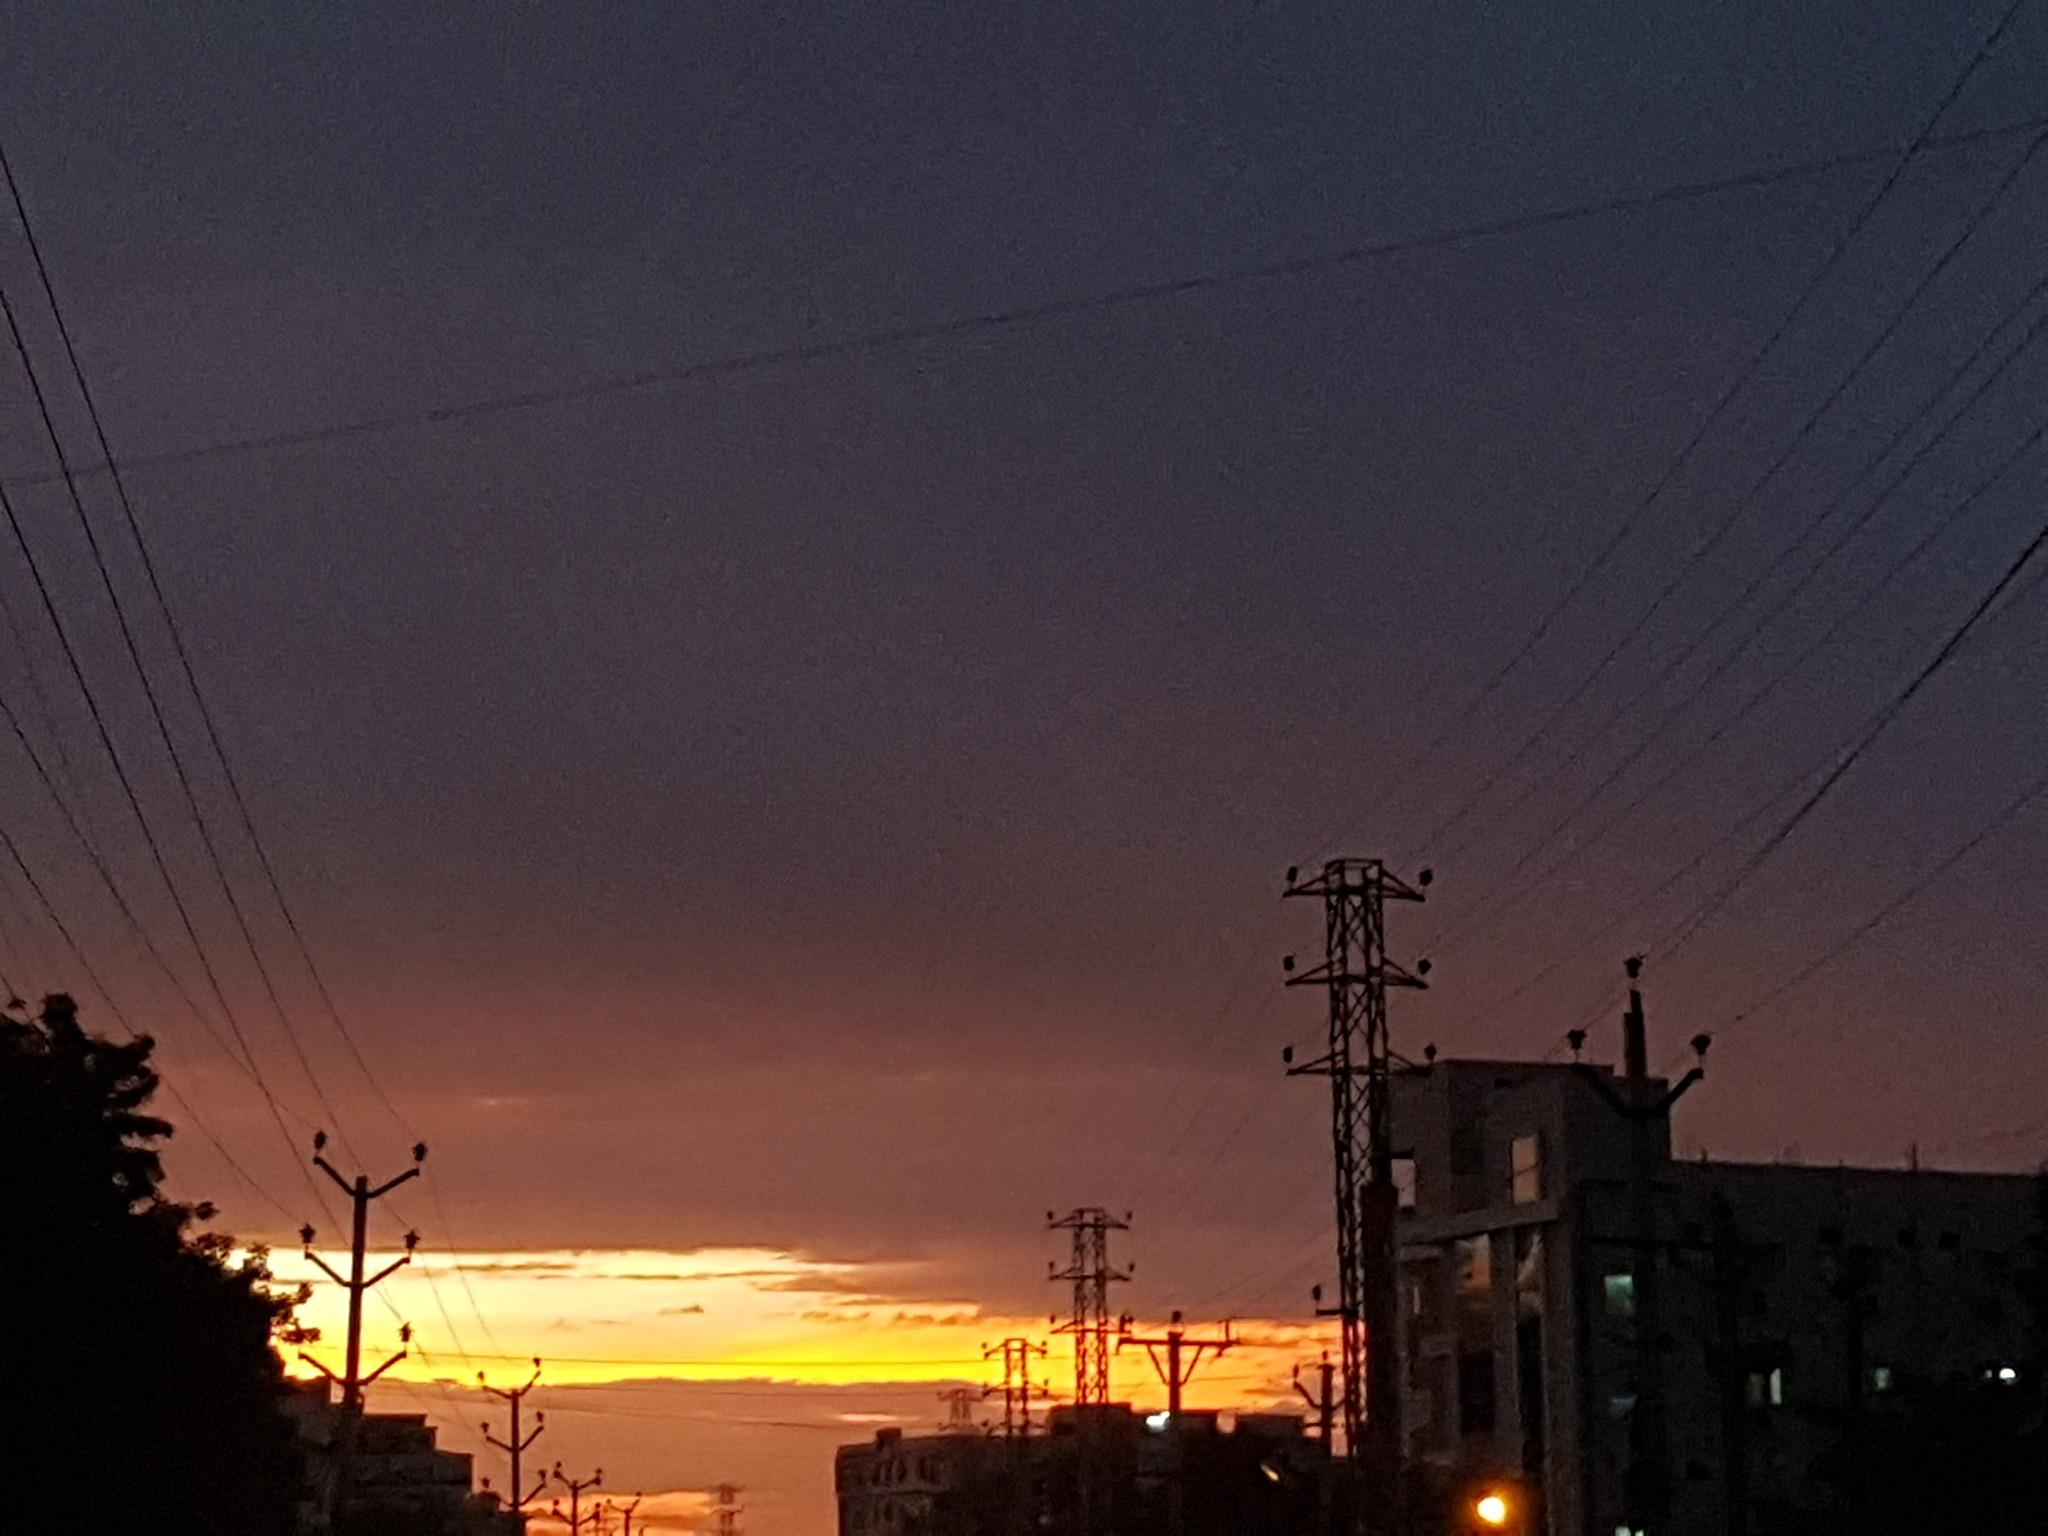 Image ID: 201252